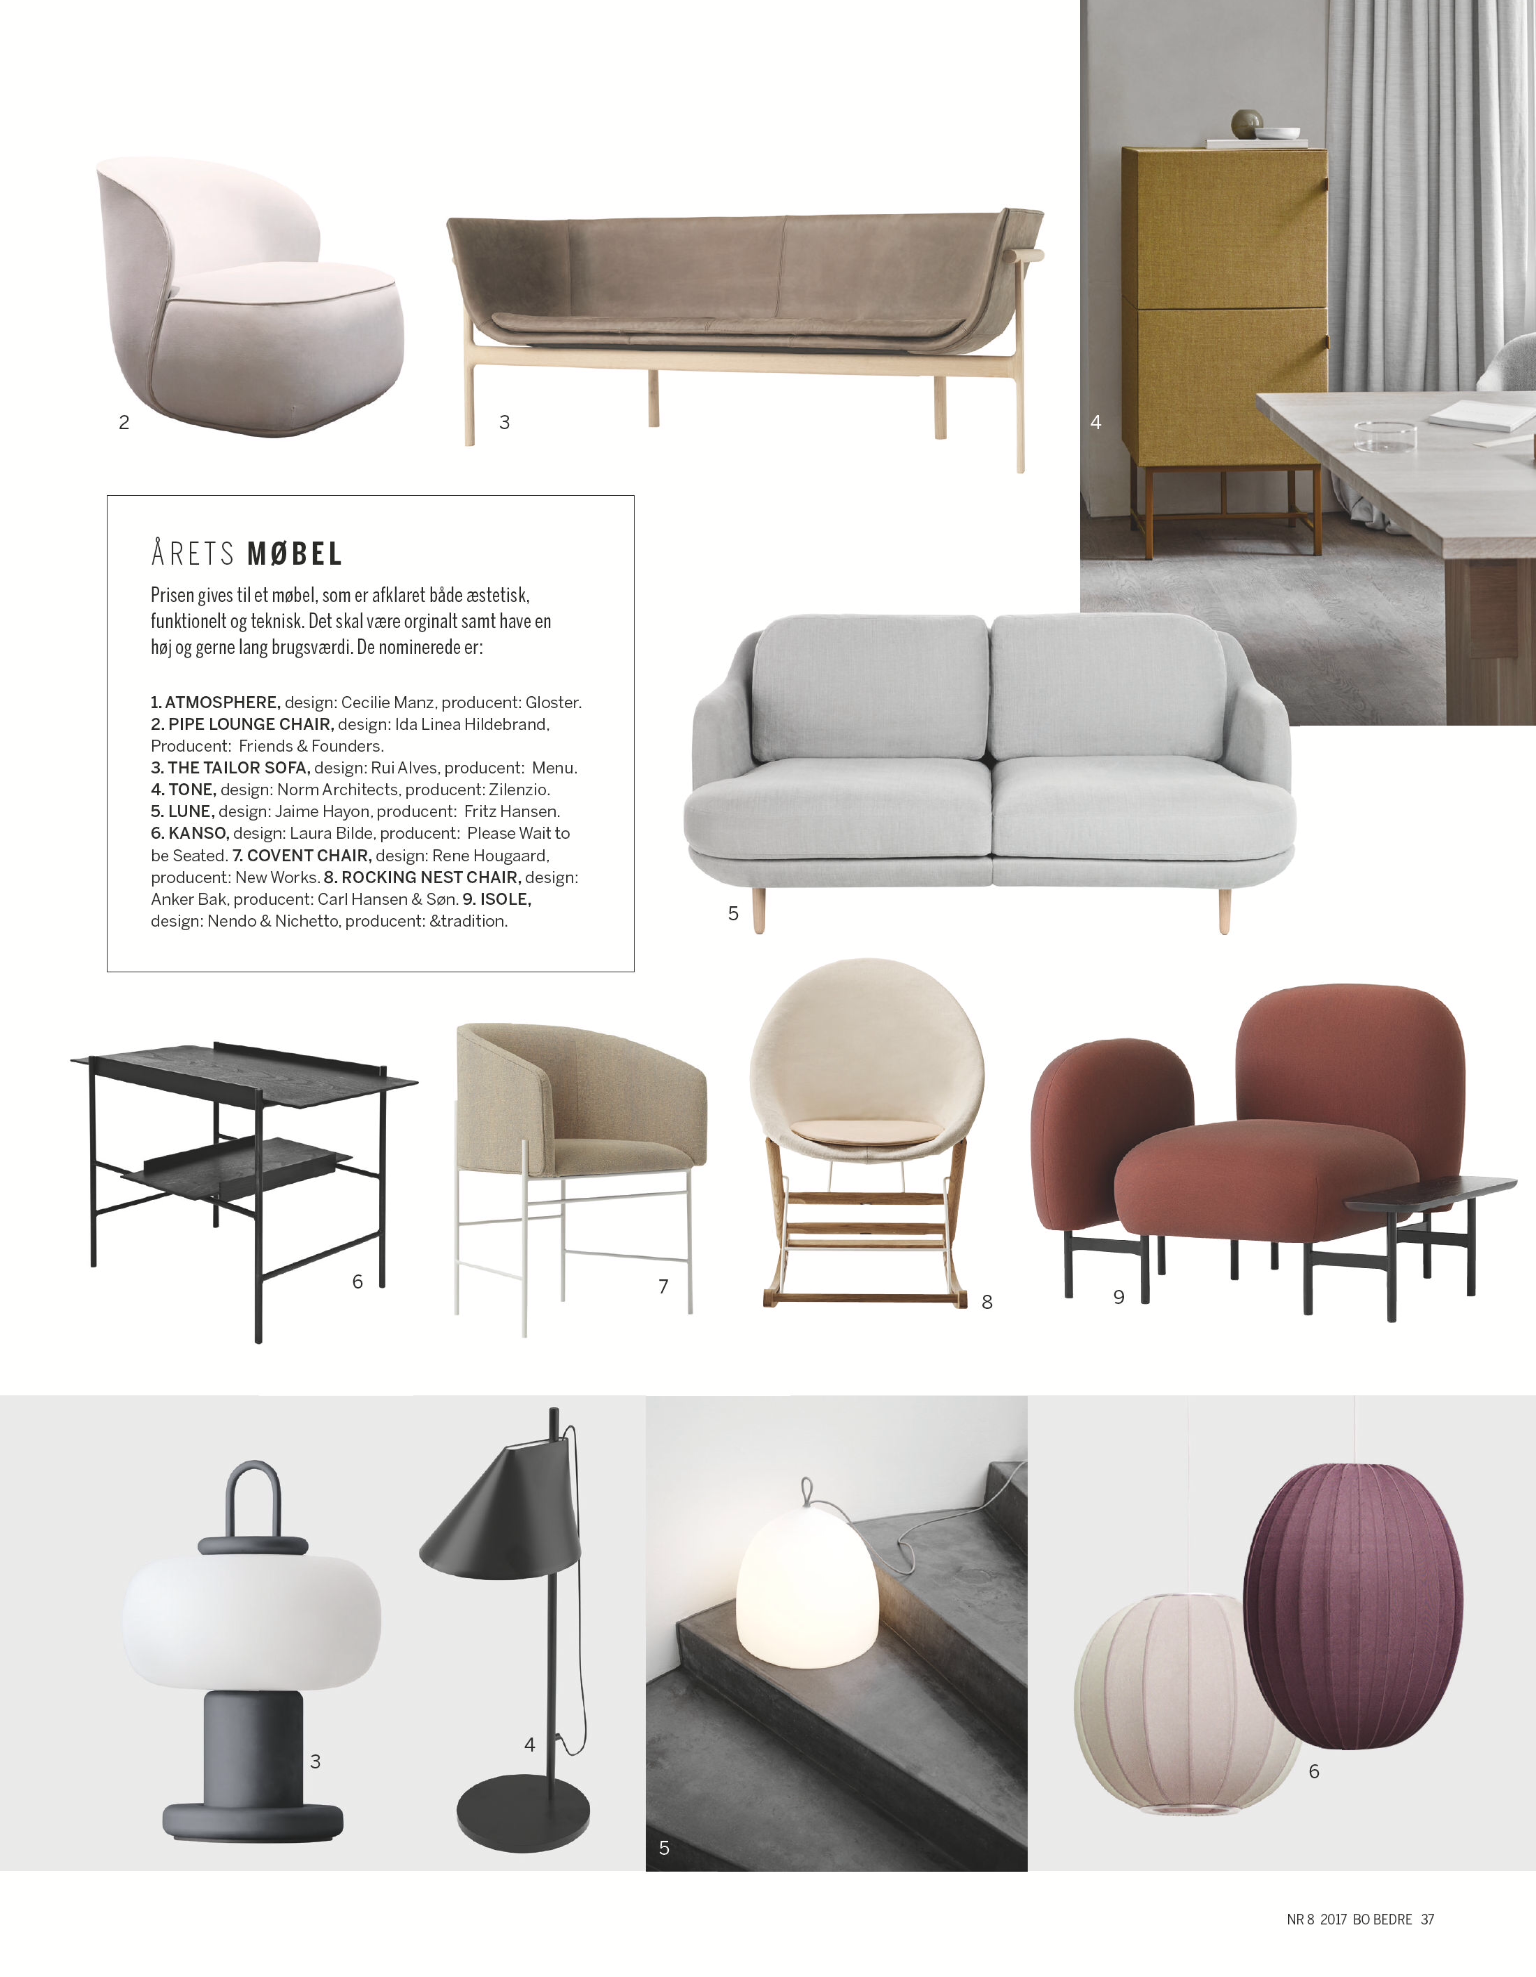 Design Award 2017 - Furniture of the Year!